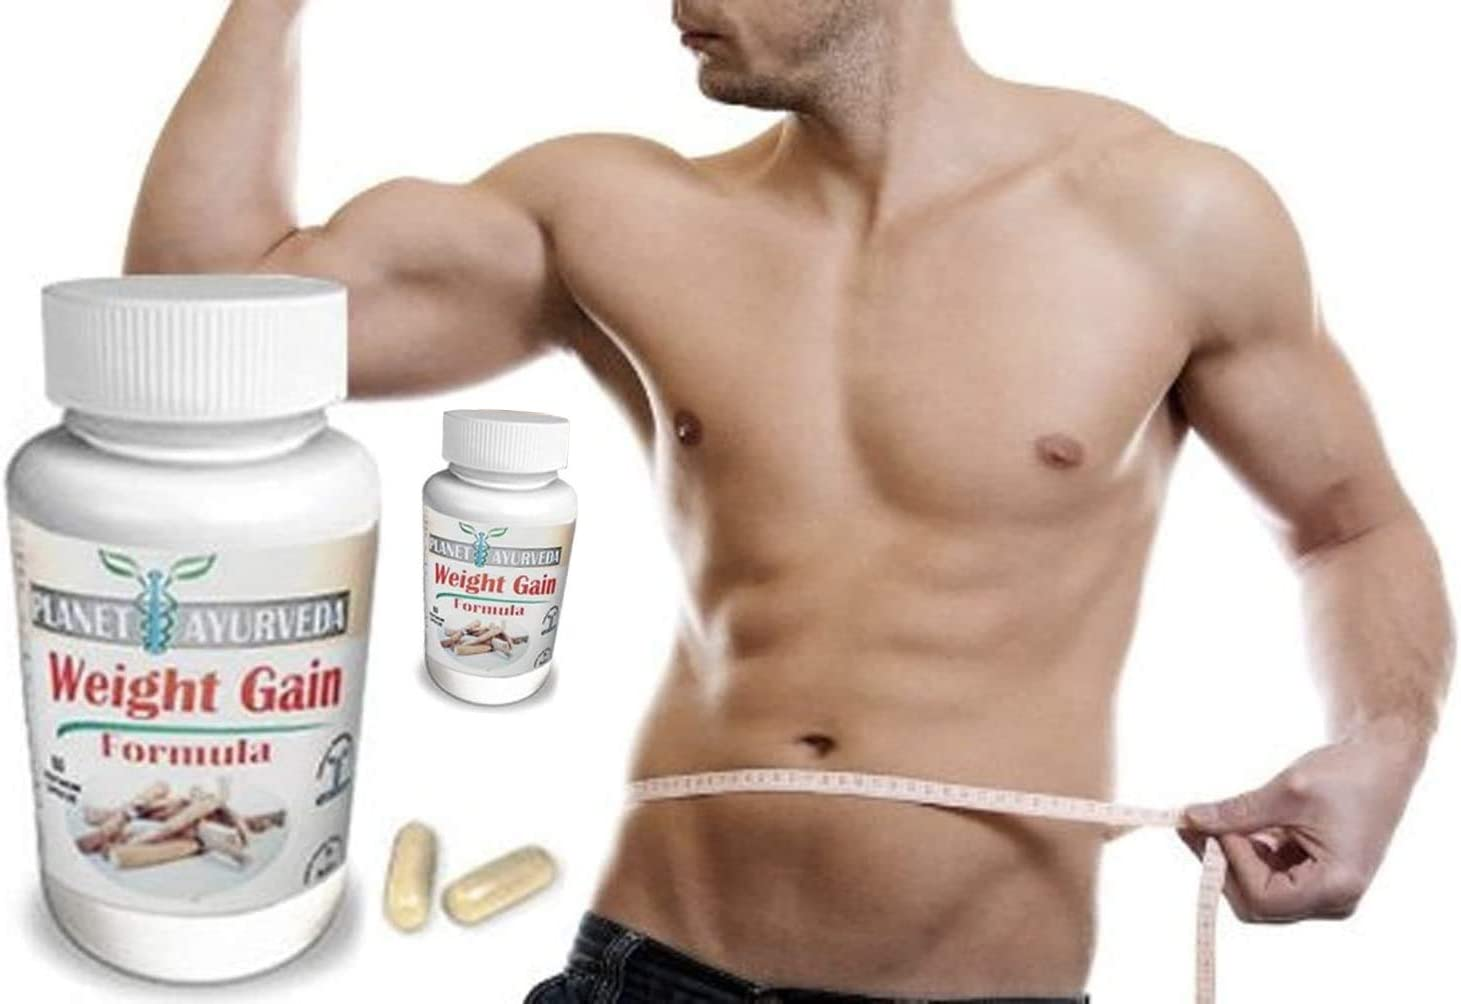 1, 2, 3 or 4 Pack. GAIN Mass Men 60 Tablets. Planet Ayurveda Weight Gain. Mass Gainer Formula Gain Weight Men. Gain Mass Quickly Pills to gain Weight for Men. Gain True Mass Easily (2 Bottle Pack)